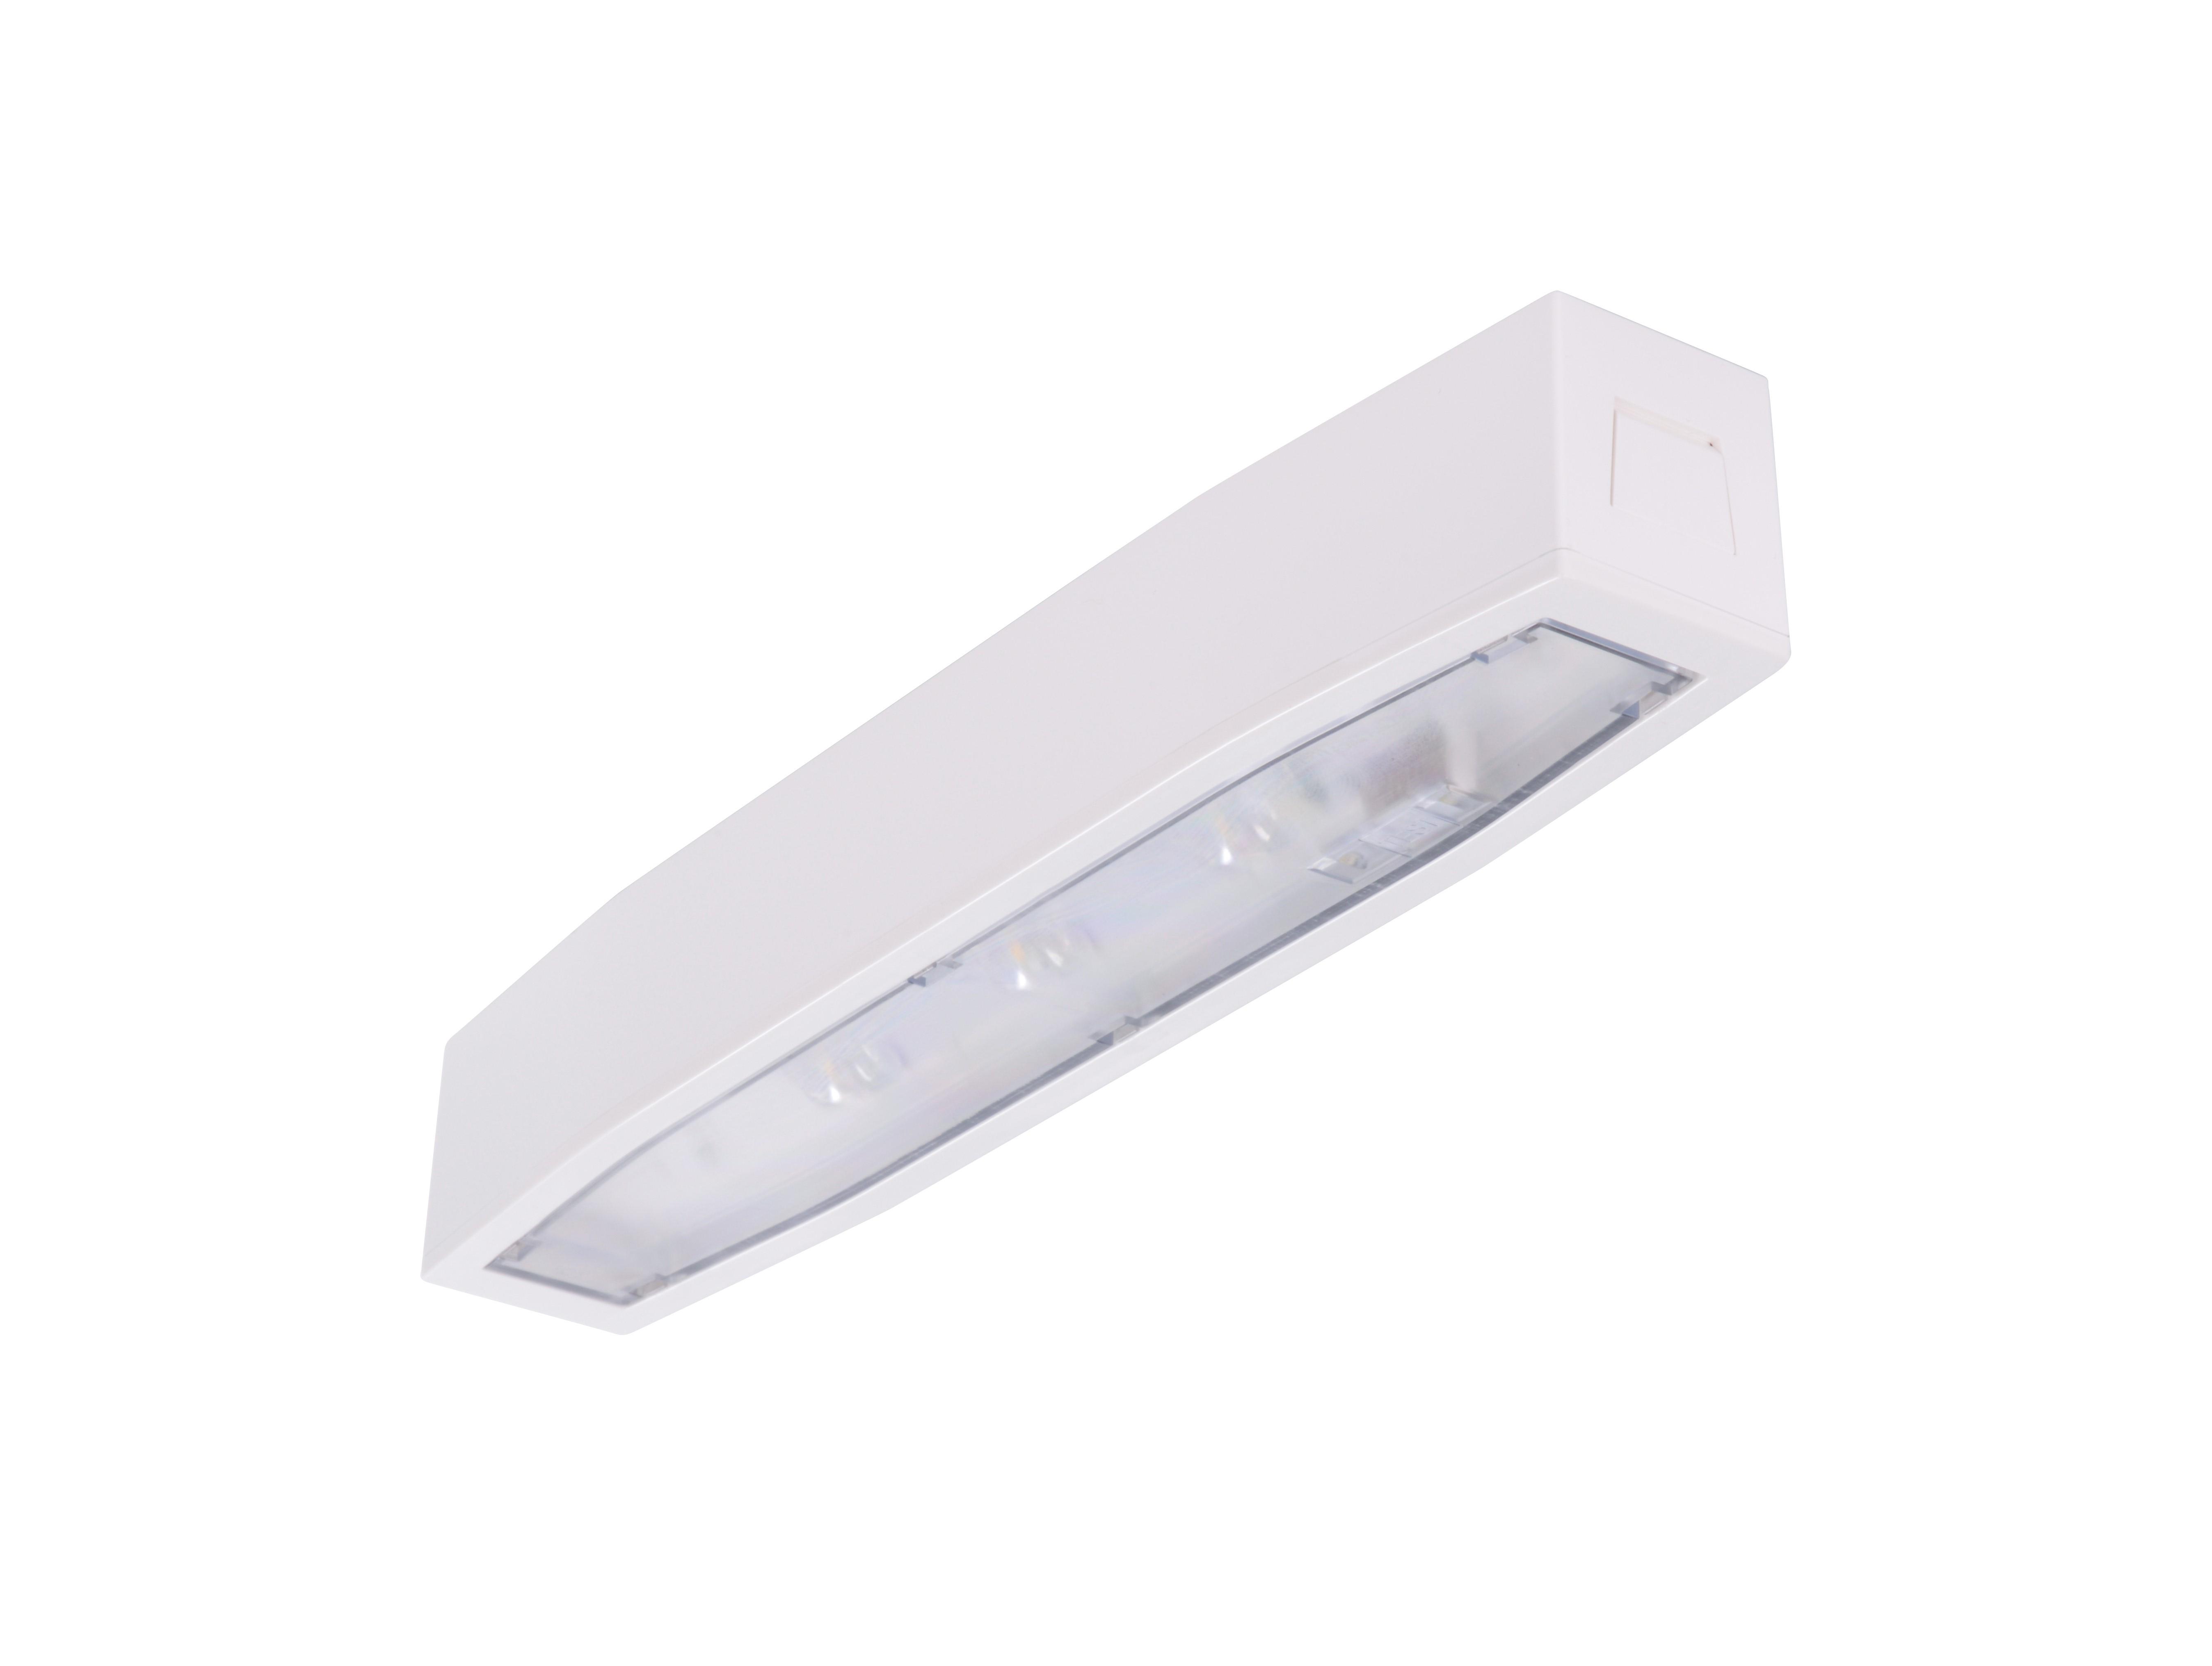 Lampa antipanica led Intelight 94717   3h nementinut test automat 0